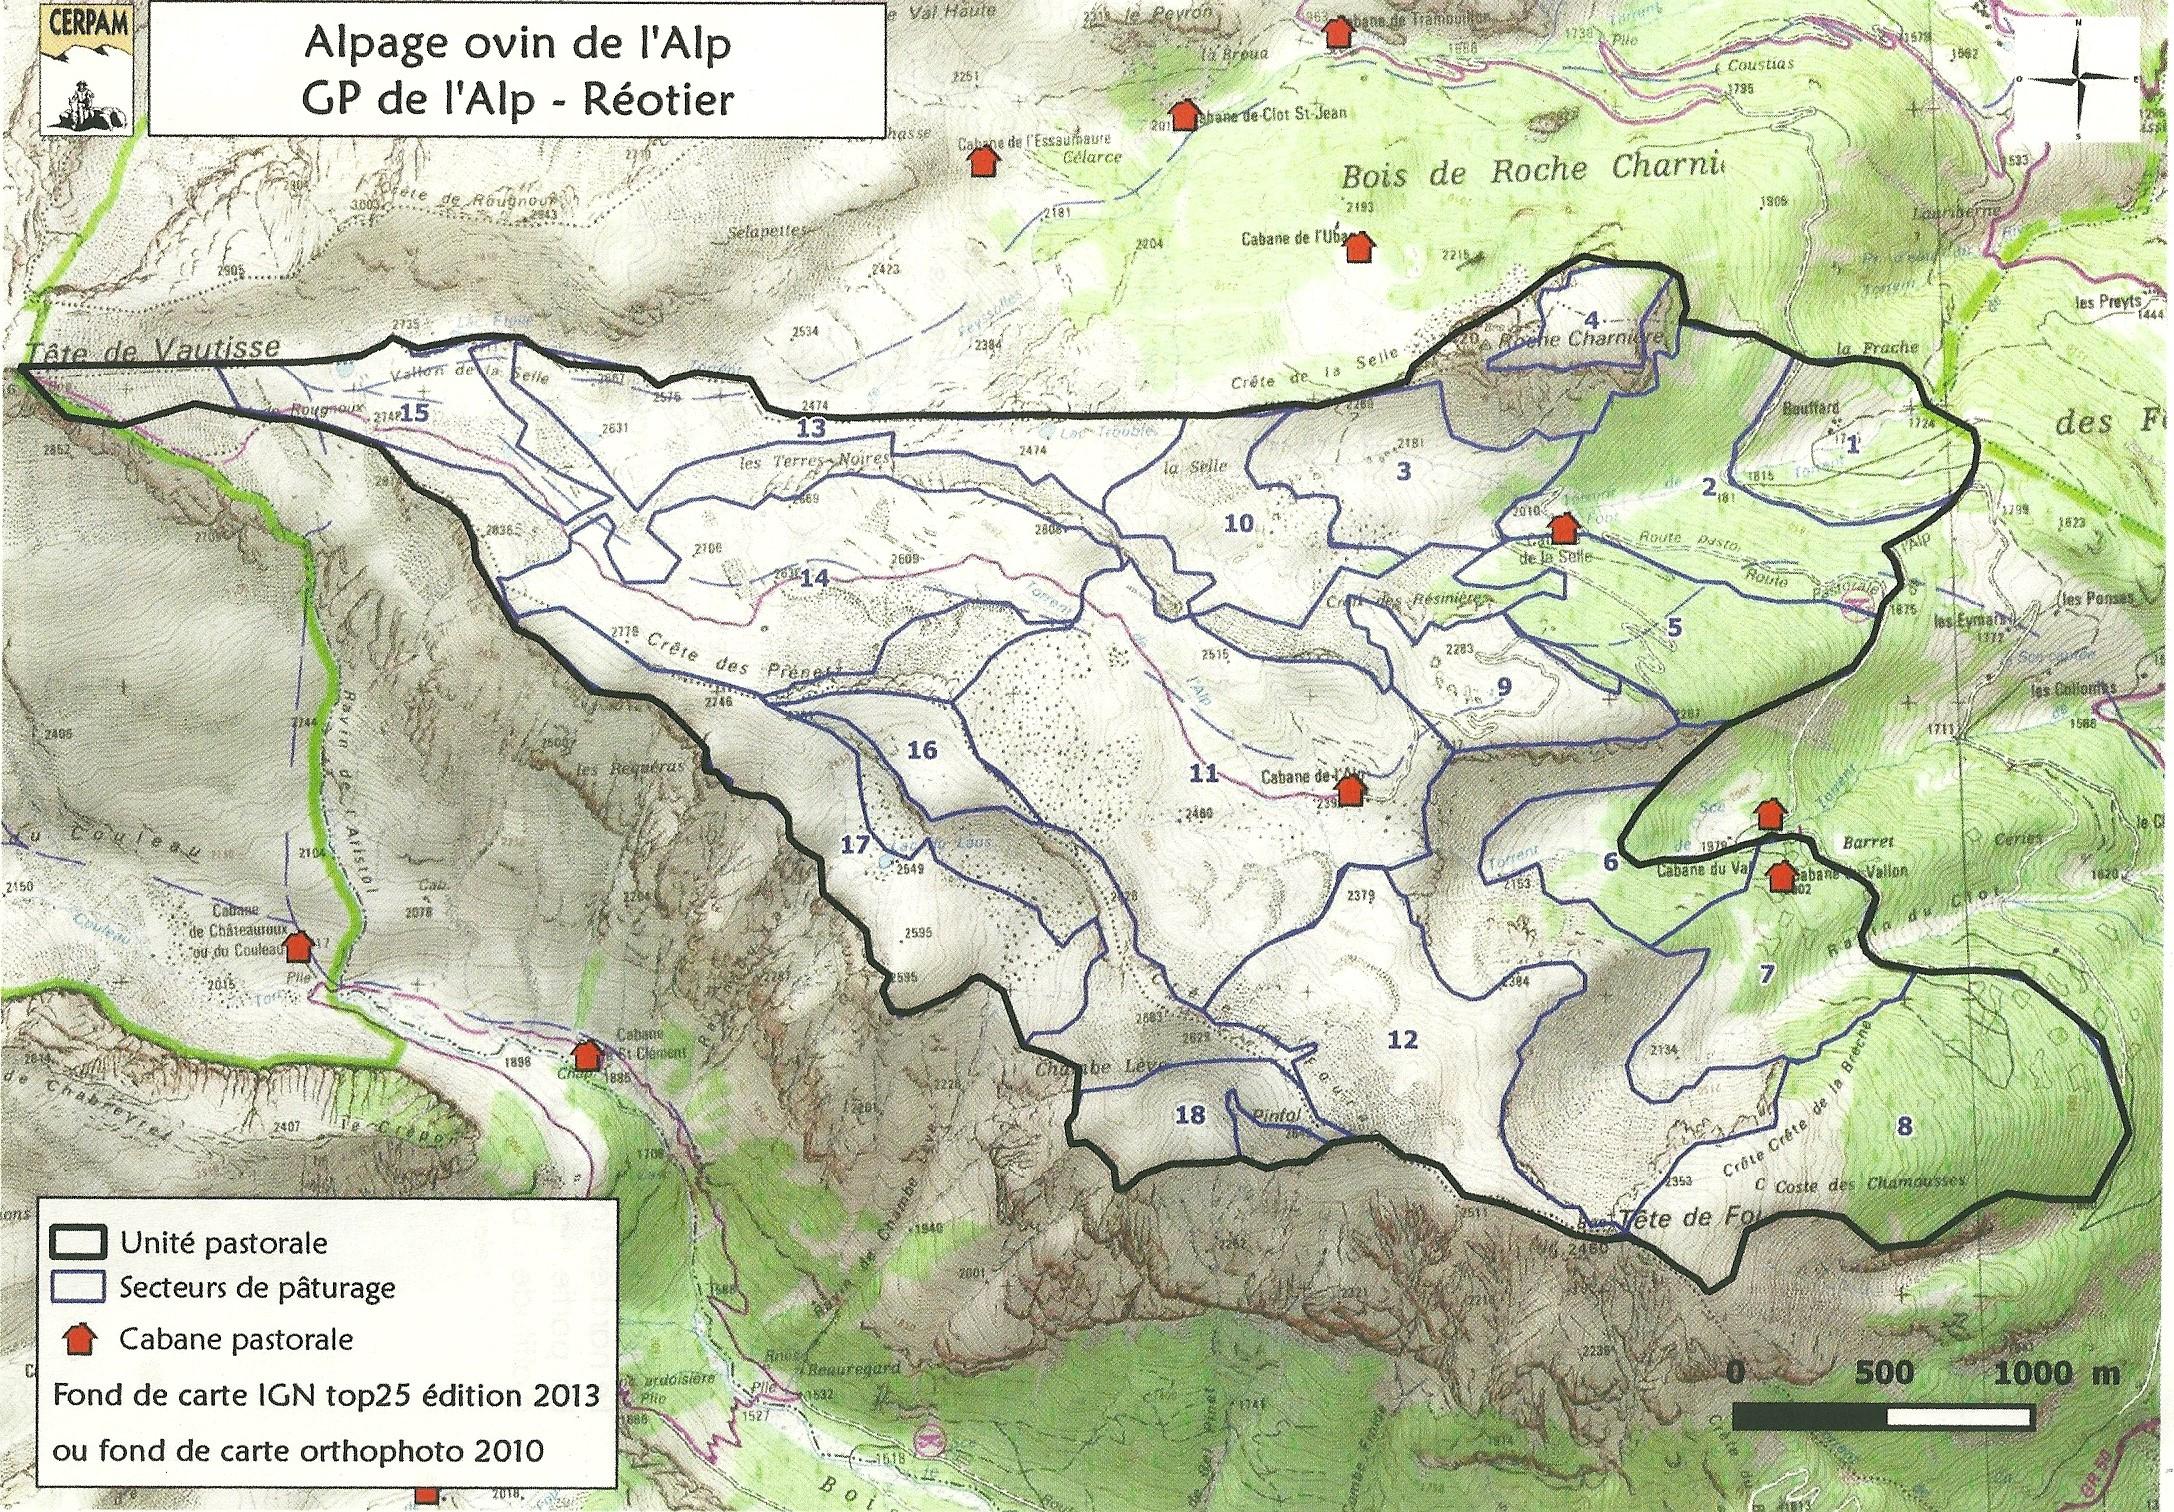 Plan alpage de l'Alp ovin